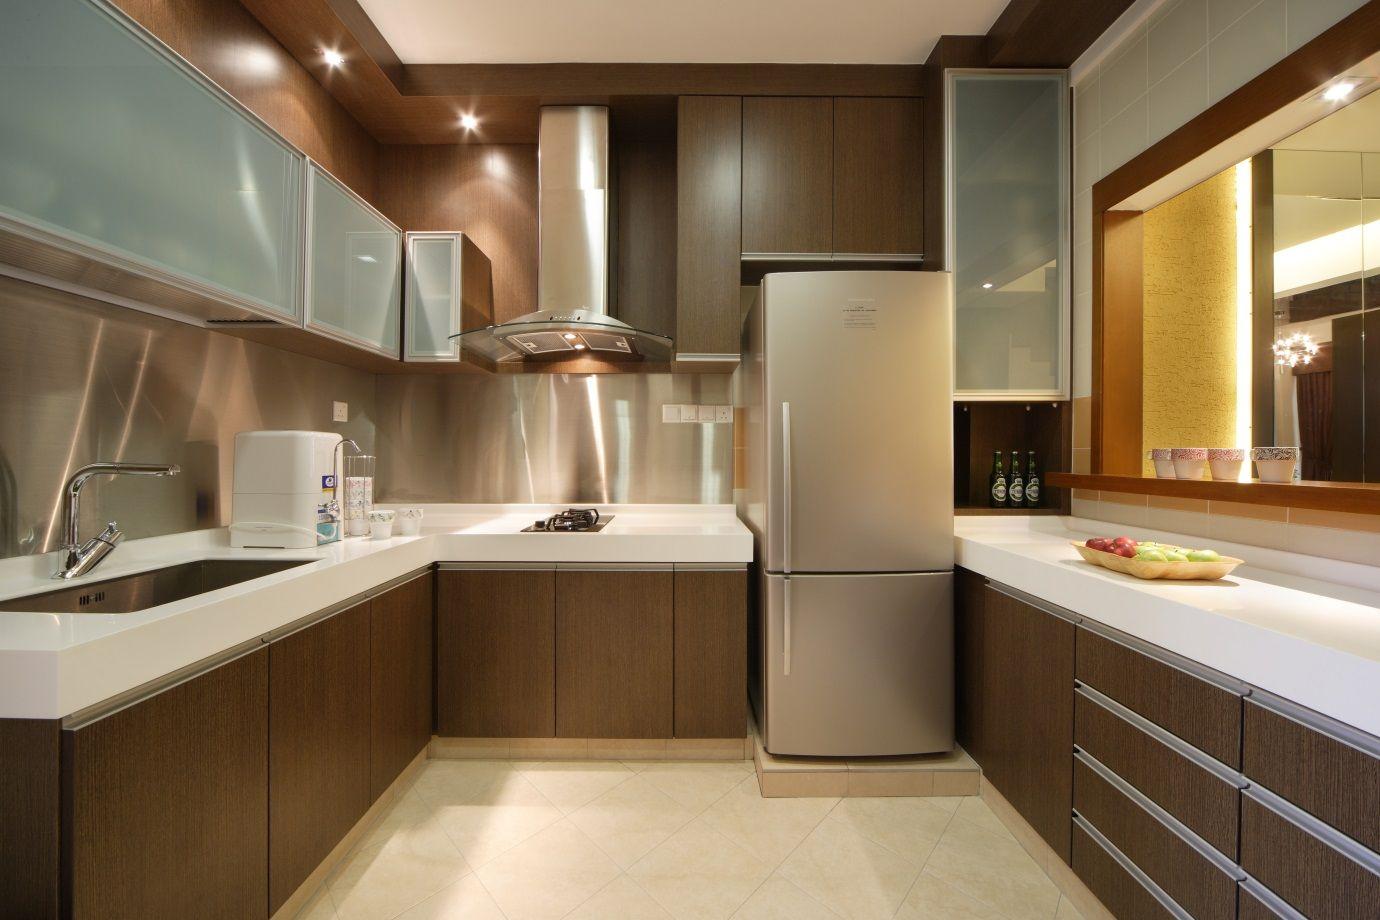 Malaysia modern kitchen cabinet design google search